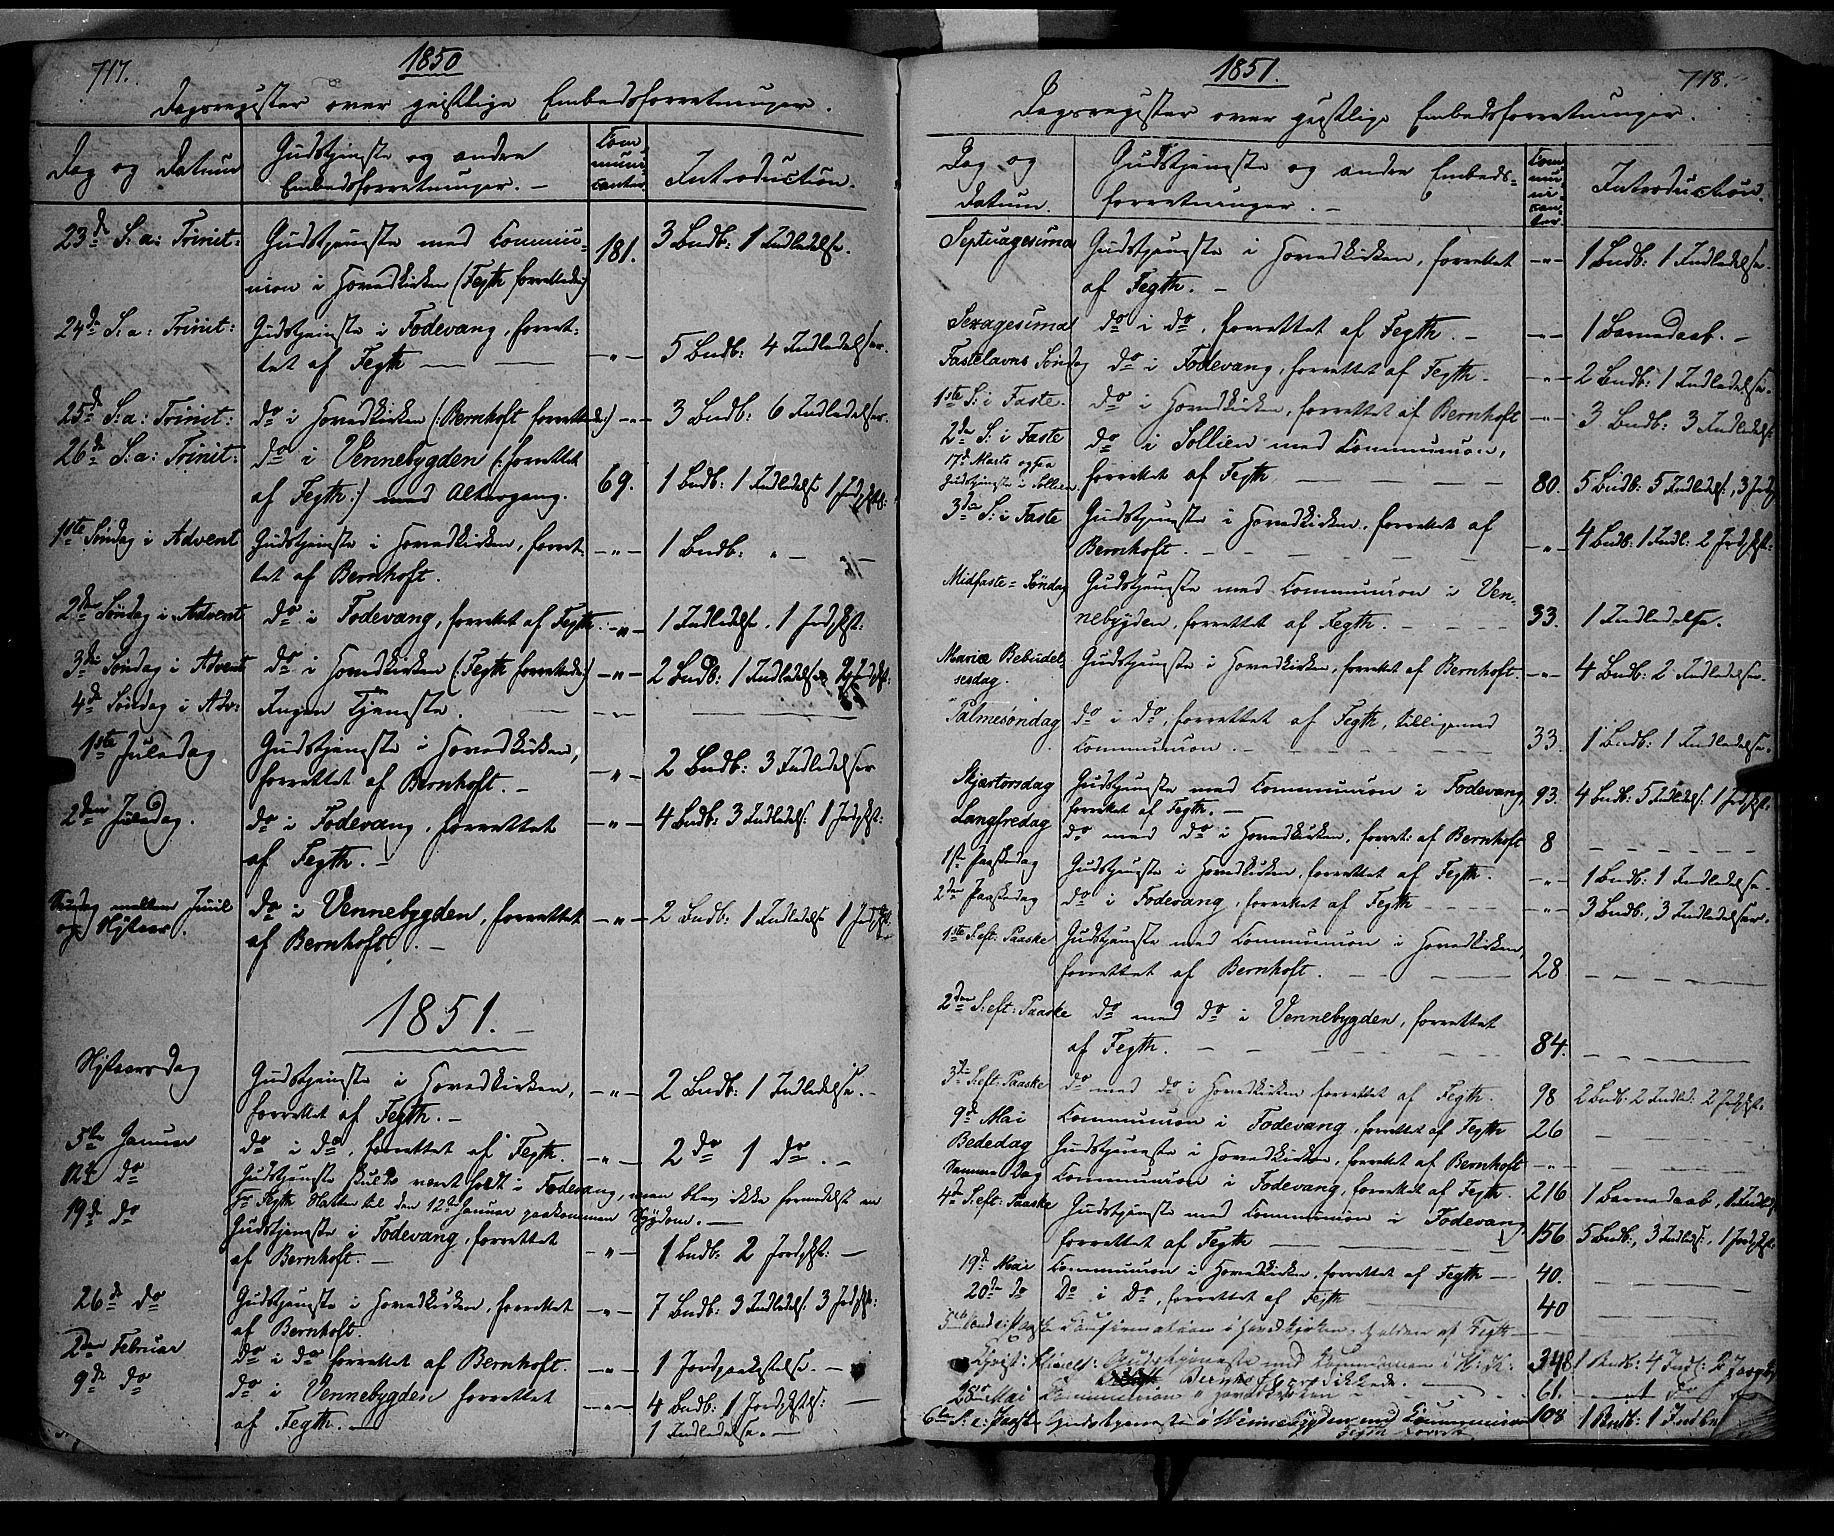 SAH, Ringebu prestekontor, Ministerialbok nr. 6, 1848-1859, s. 717-718